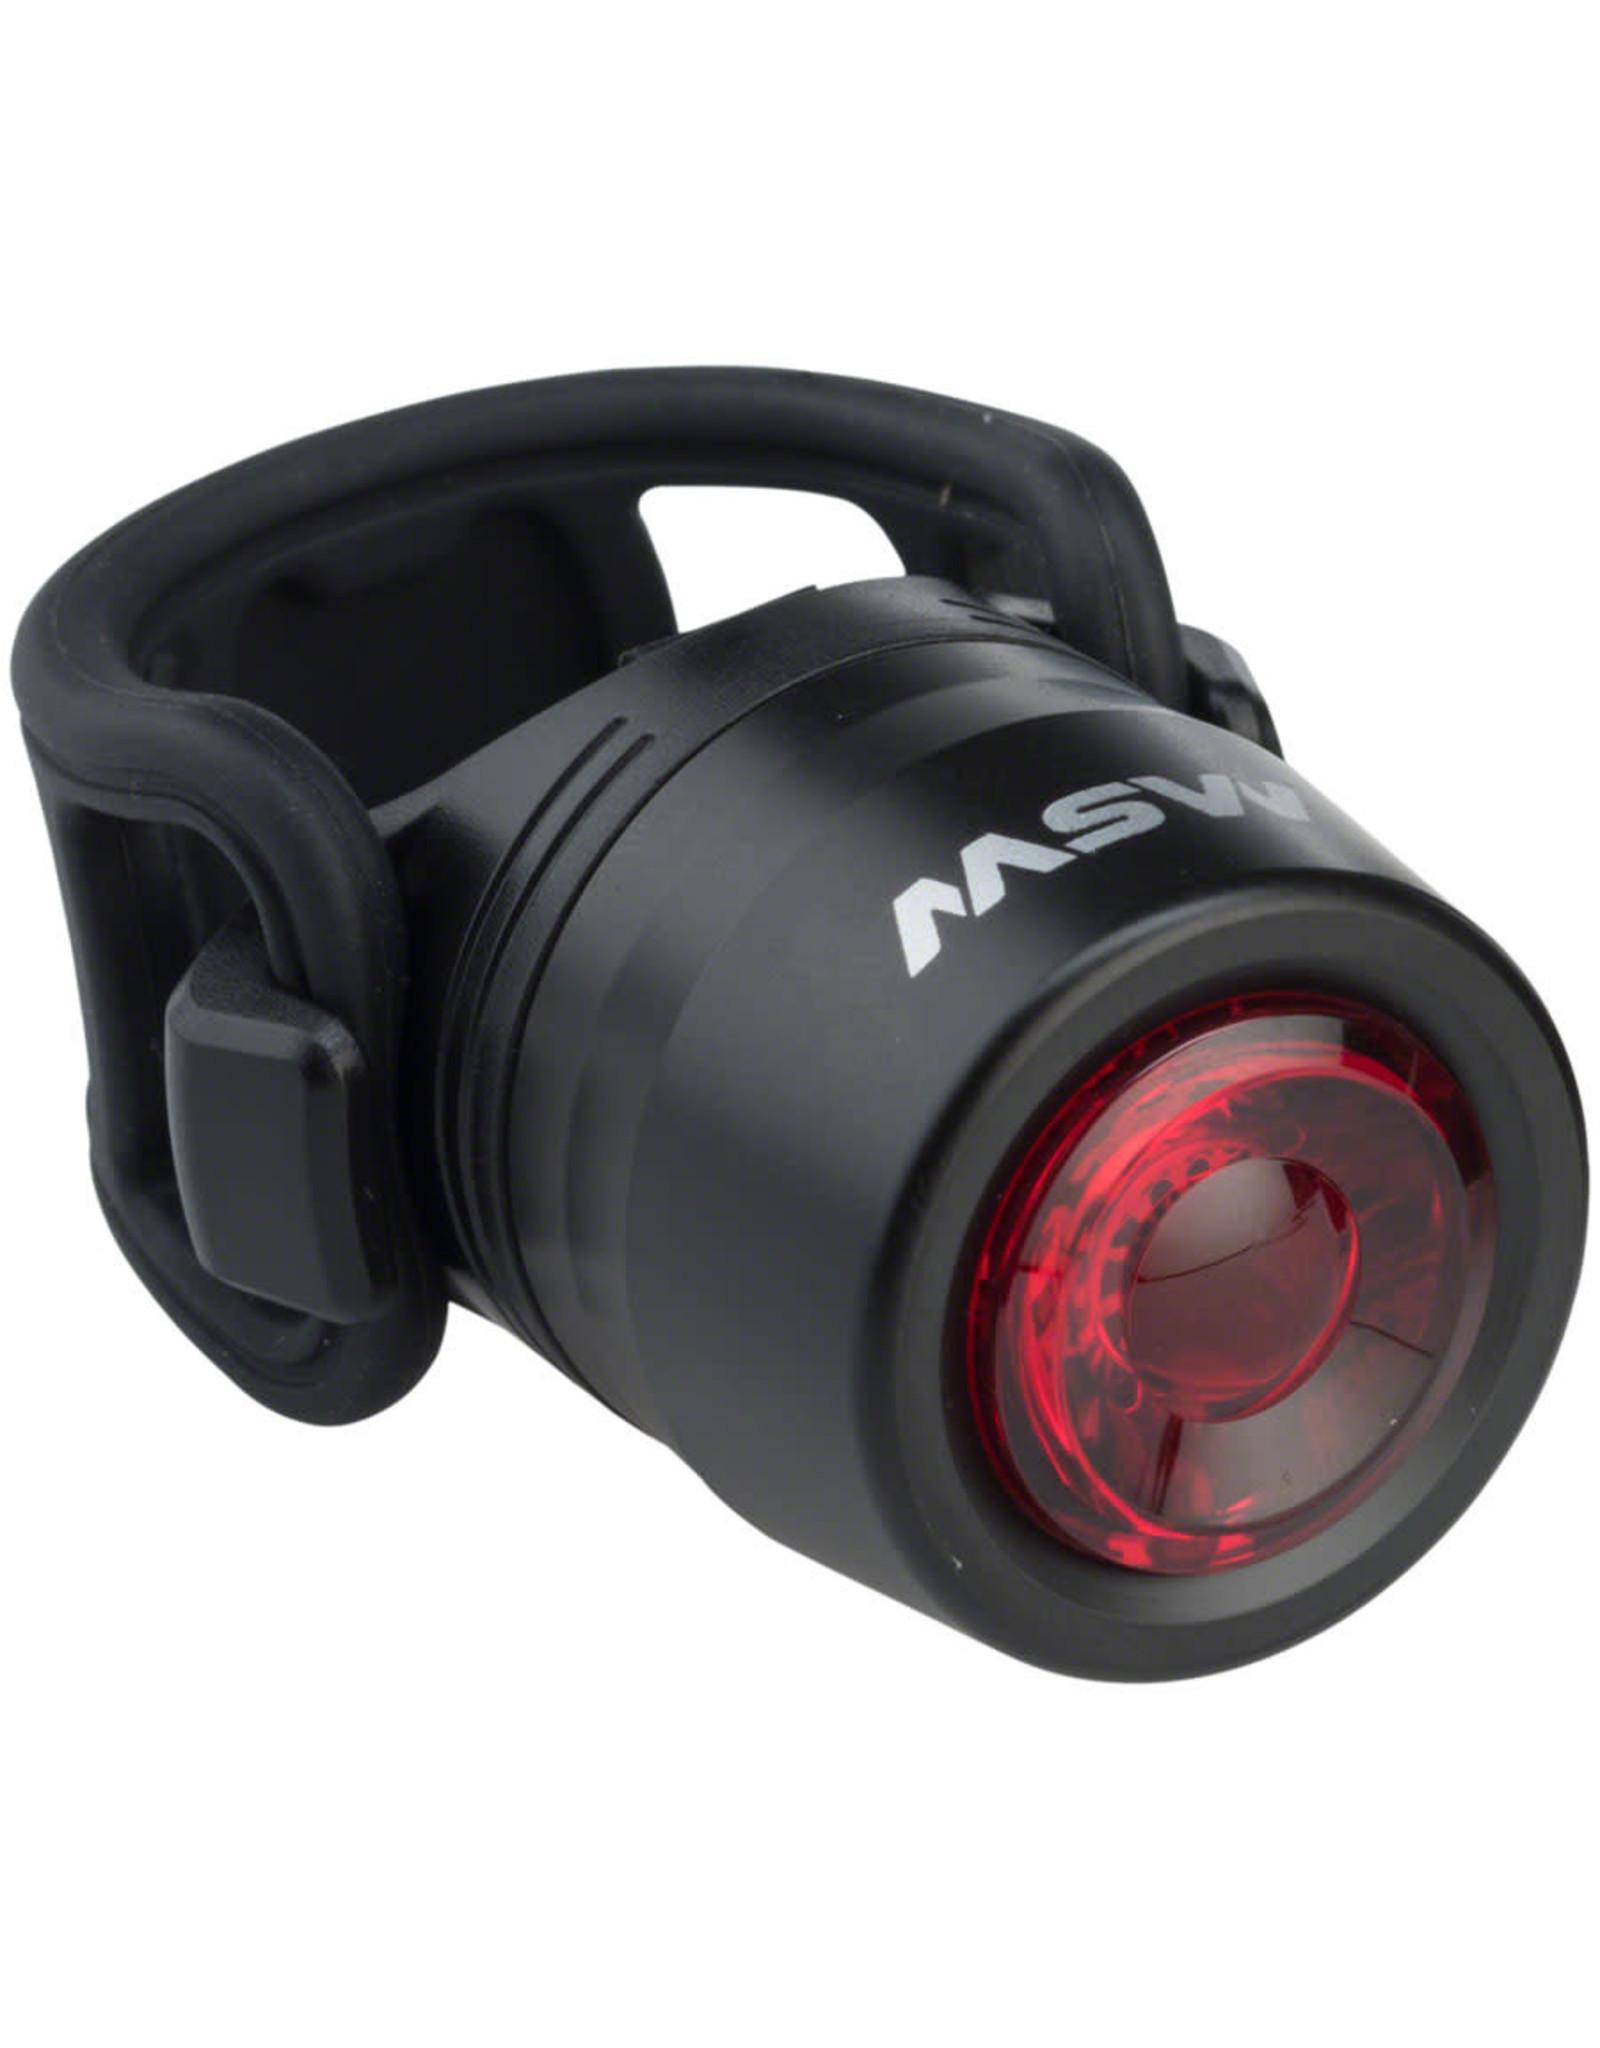 MSW MSW TLT-015 Cricket USB Taillight Black